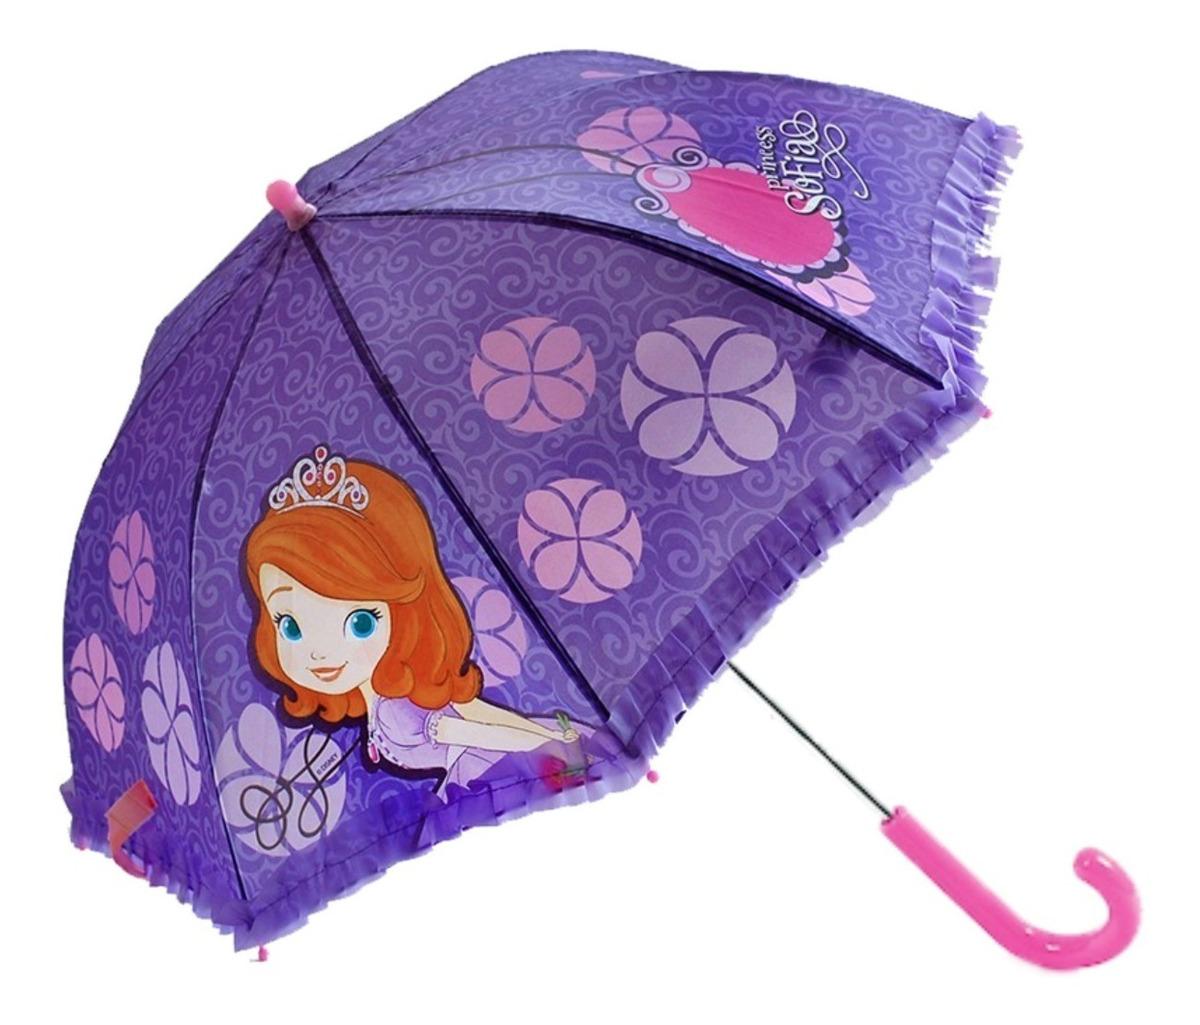 bonita y colorida muy genial talla 7 Paraguas Disney Princesita Sofia Original Mundo Manias